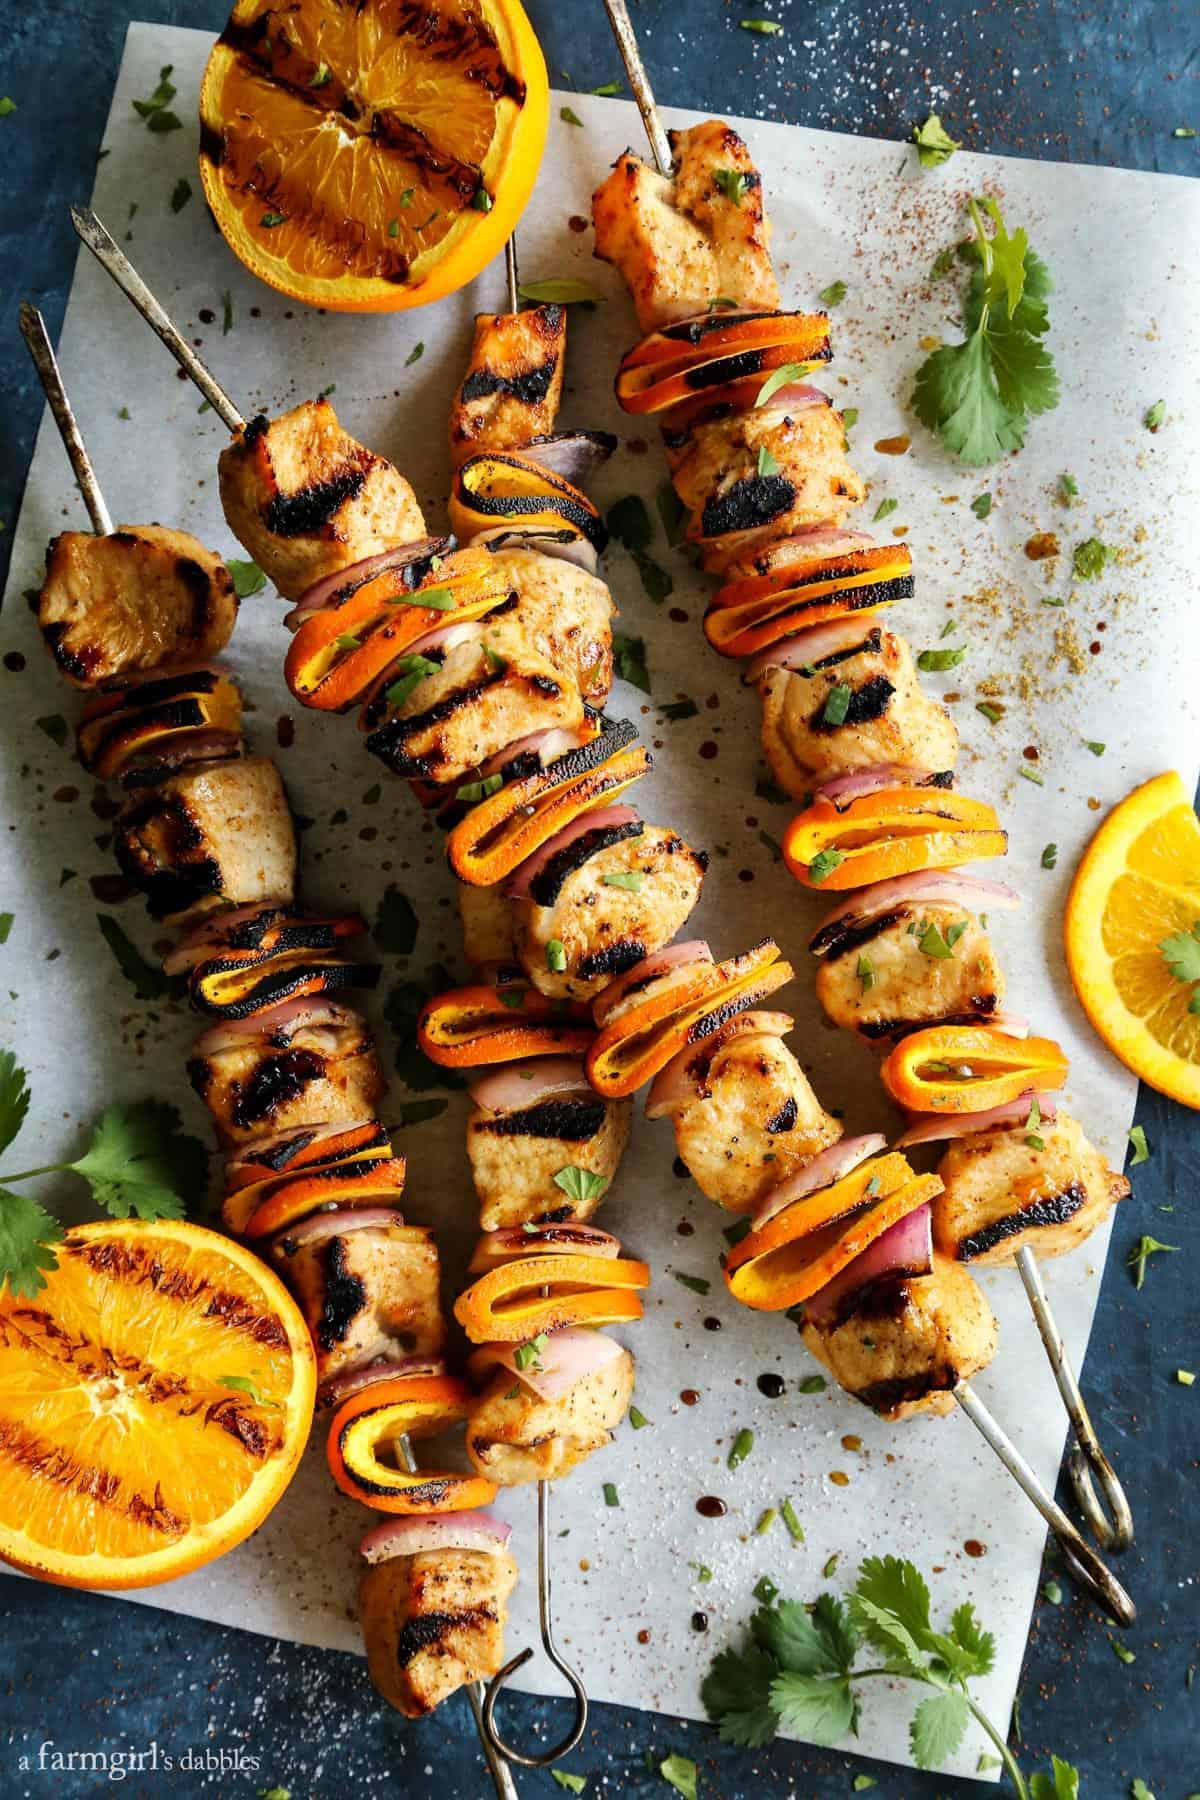 Grilled Chipotle Orange Turkey Kebabs from afarmgirlsdabbles.com